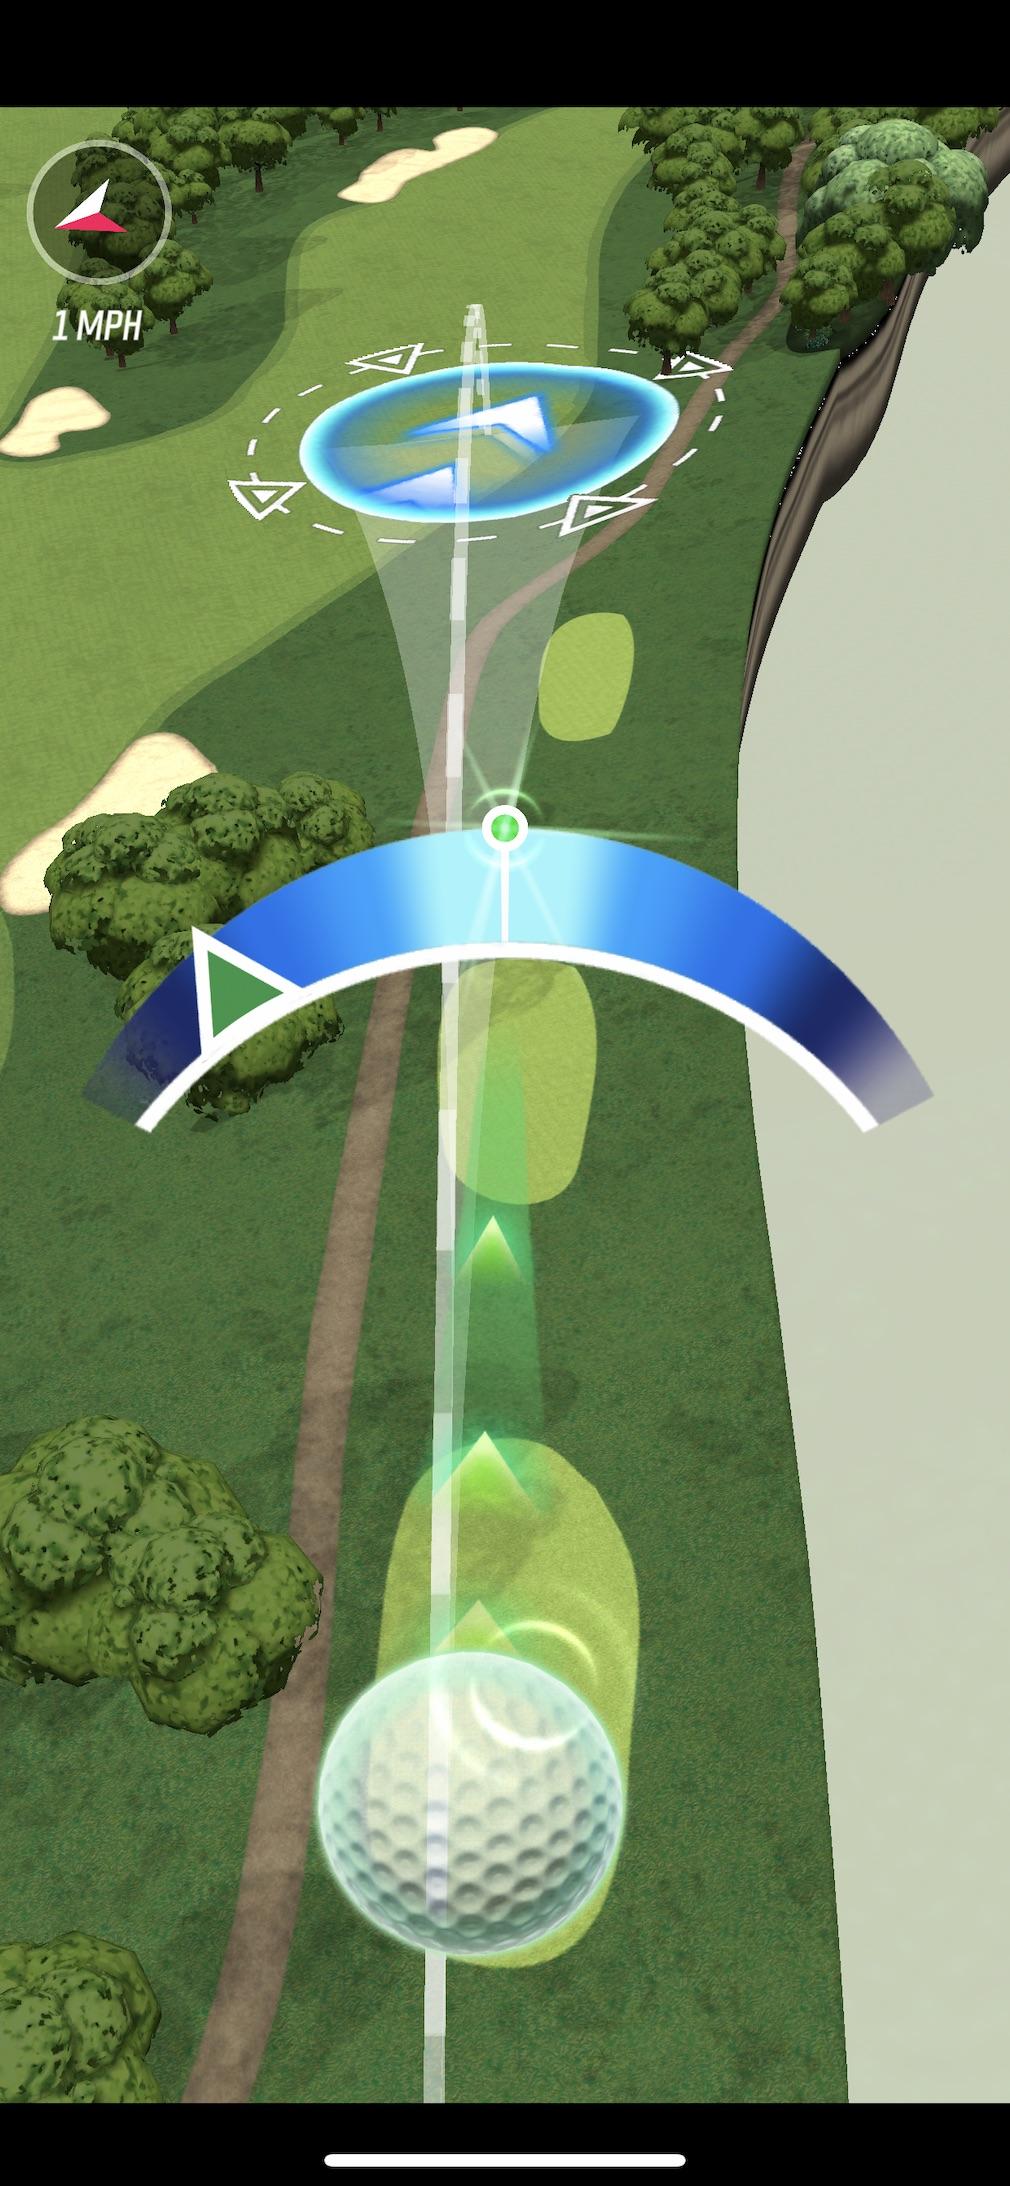 PGA Golf Tour Shootout iOS review screenshot - The ball in flight